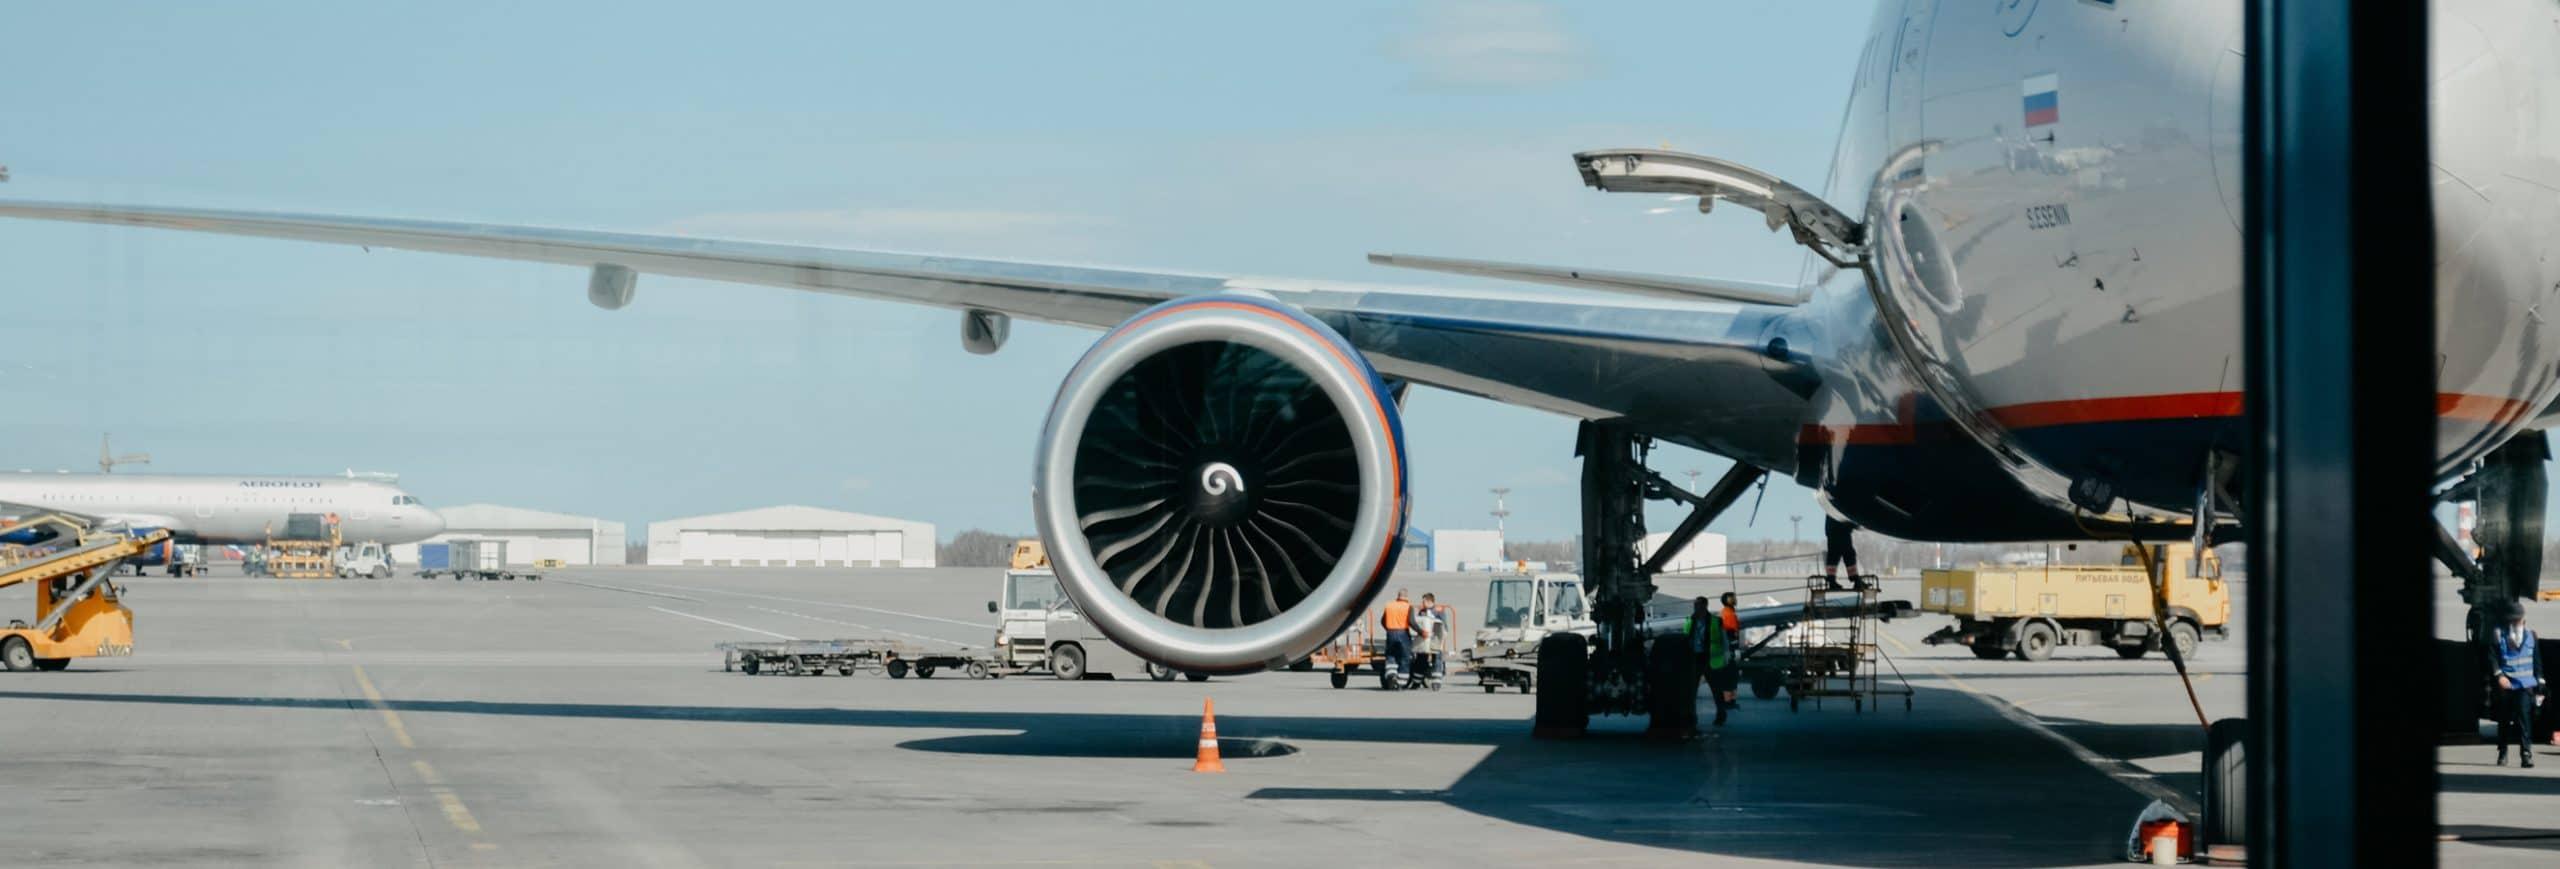 Jumbo Jet on runway